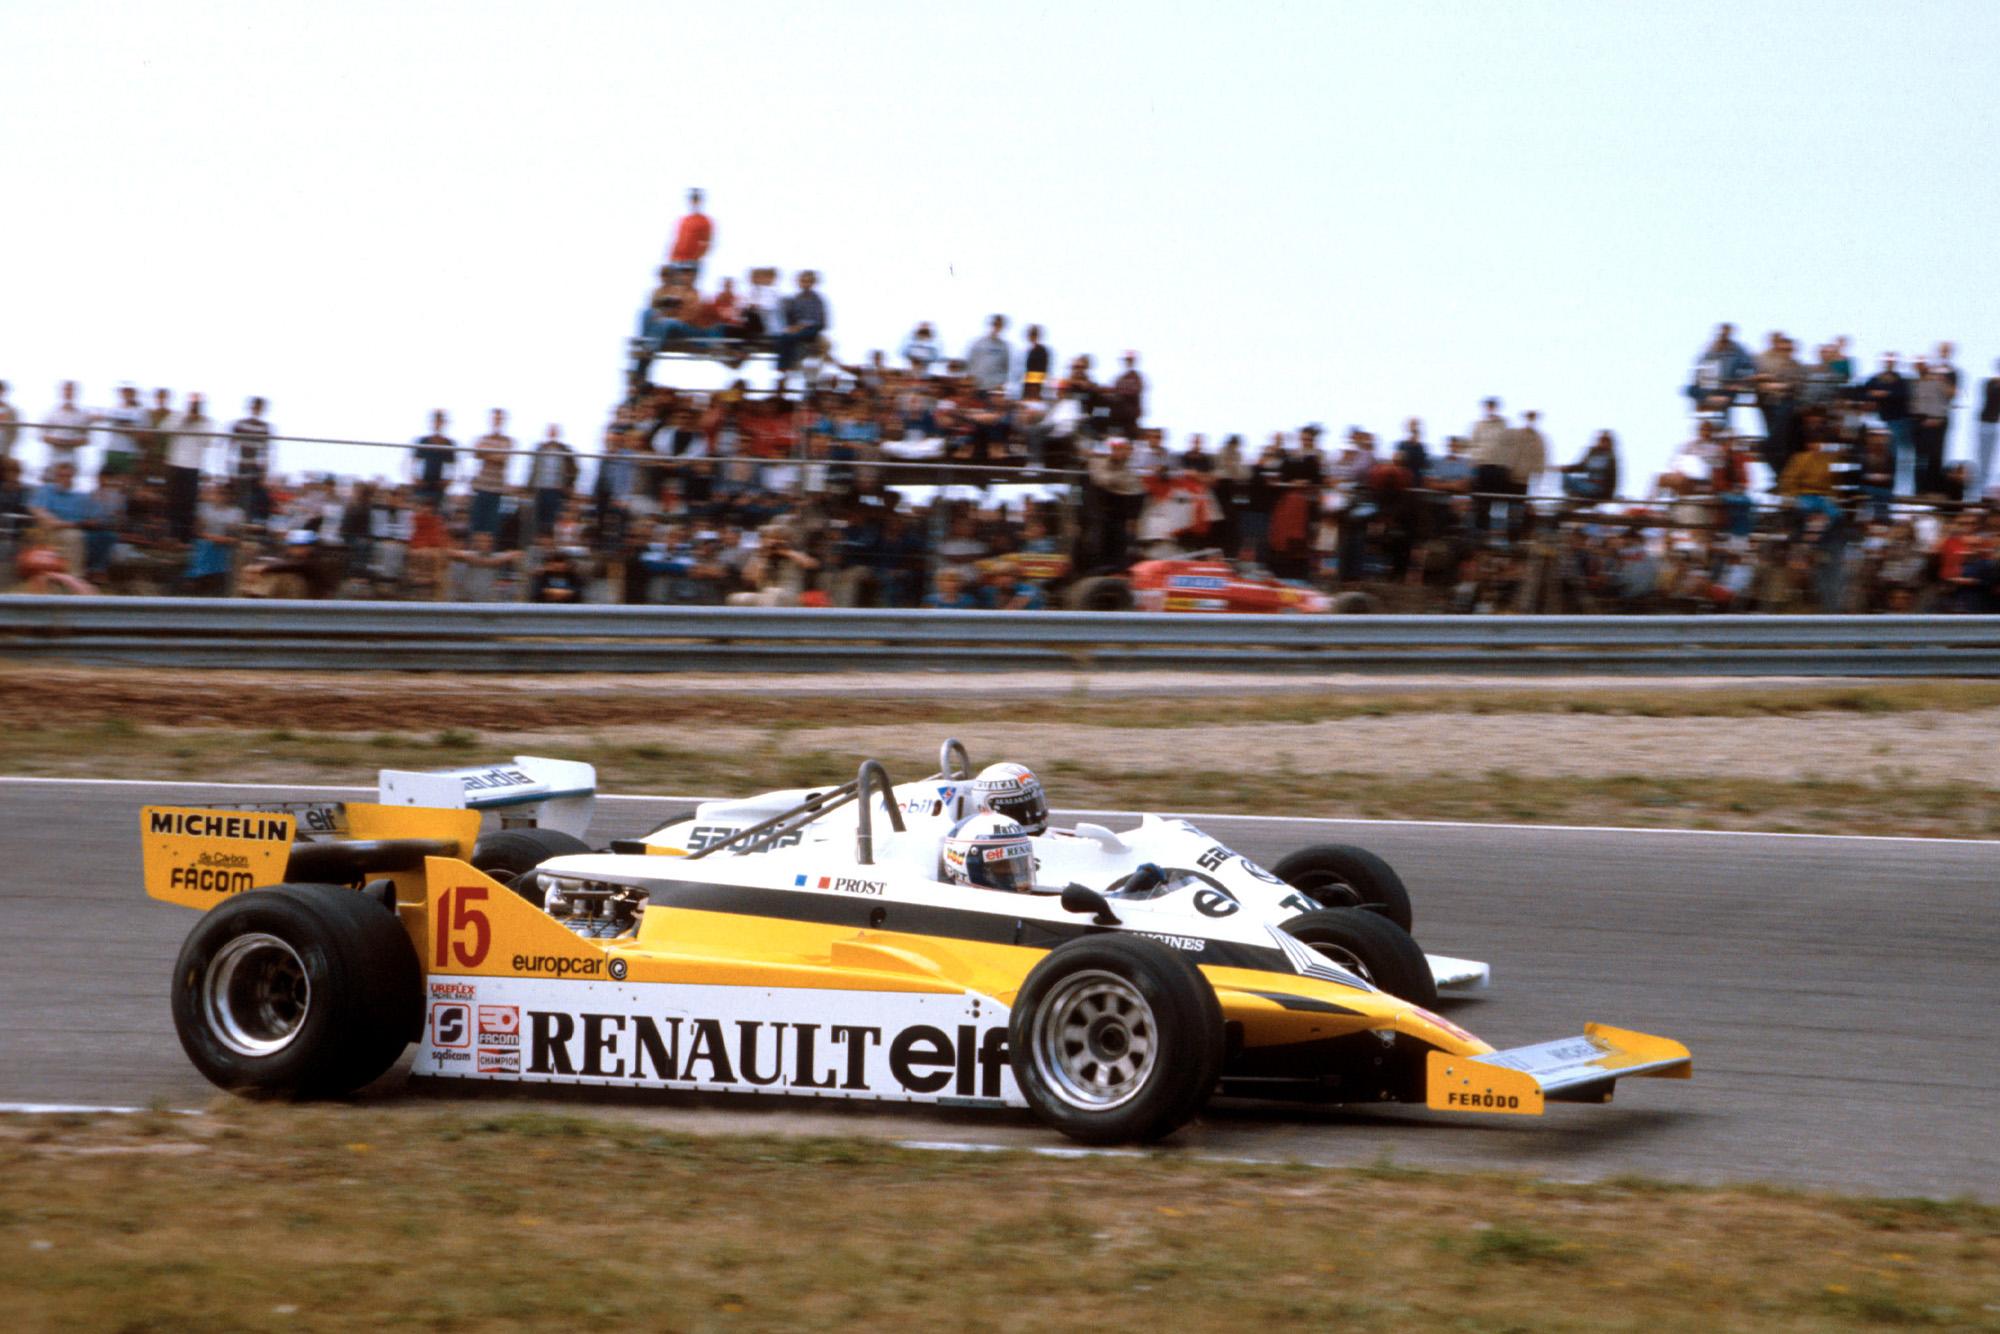 Alain Prost & Alan Jones